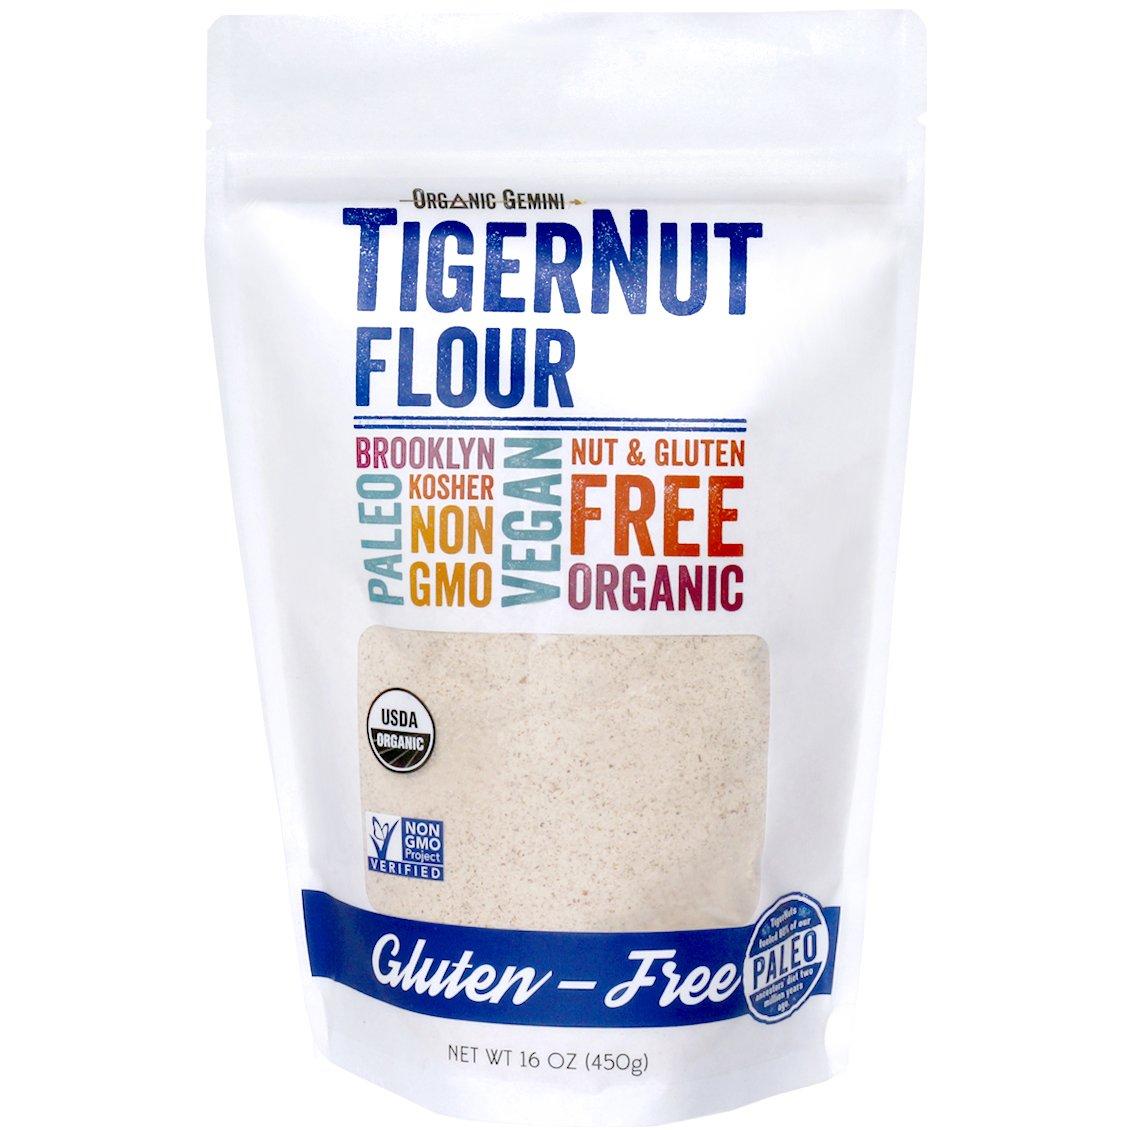 Organic Gemini TigerNut Flour, Organic, Gluten-Free, 2 lb.